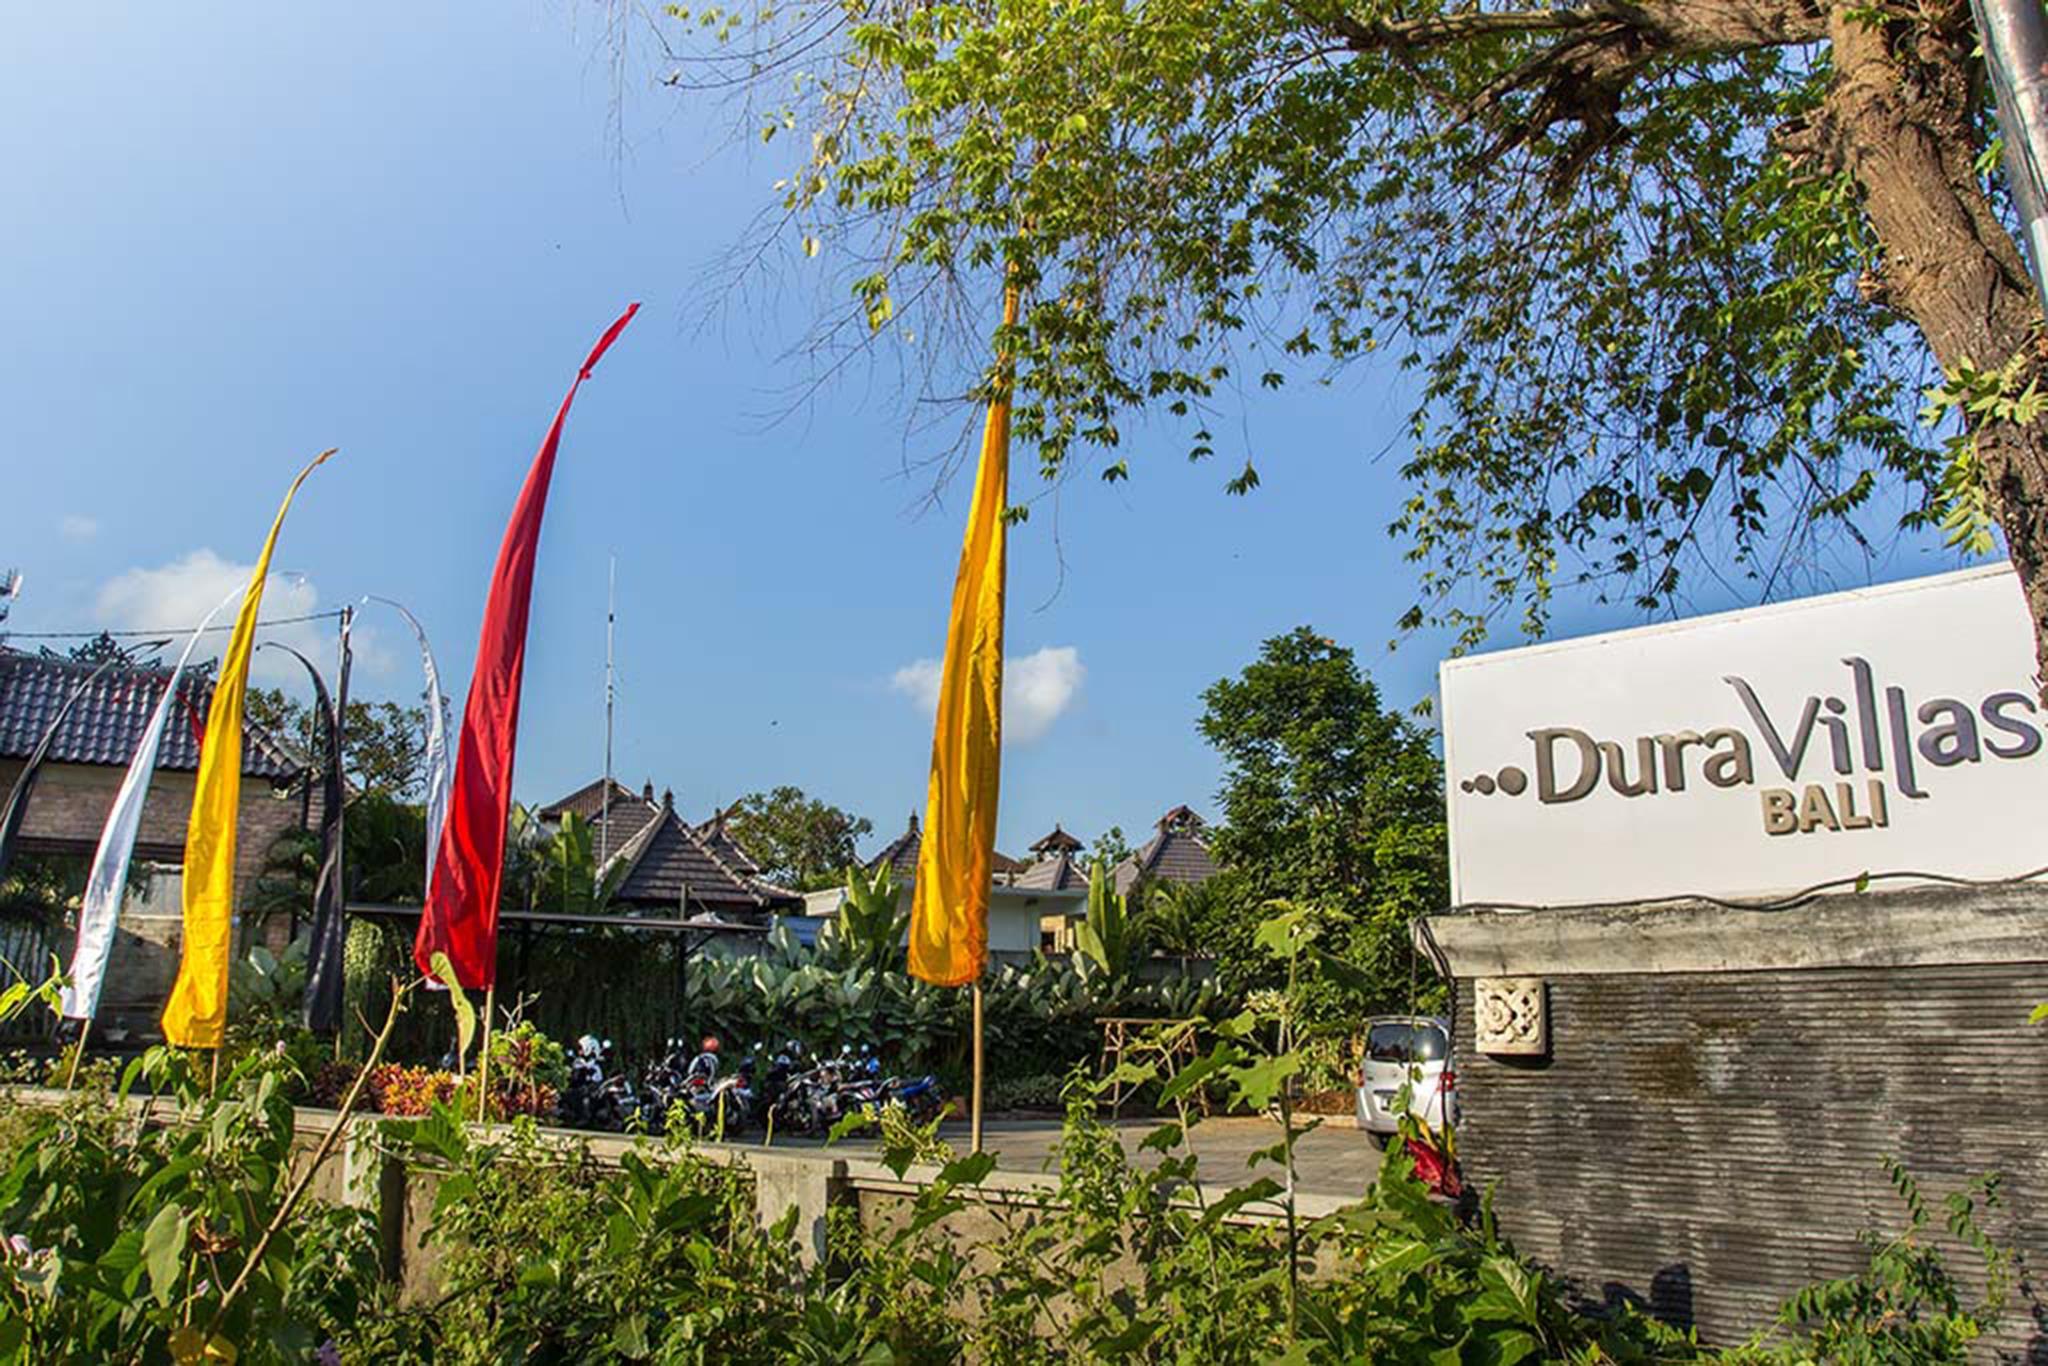 Dura Villas Bali ホテル詳細